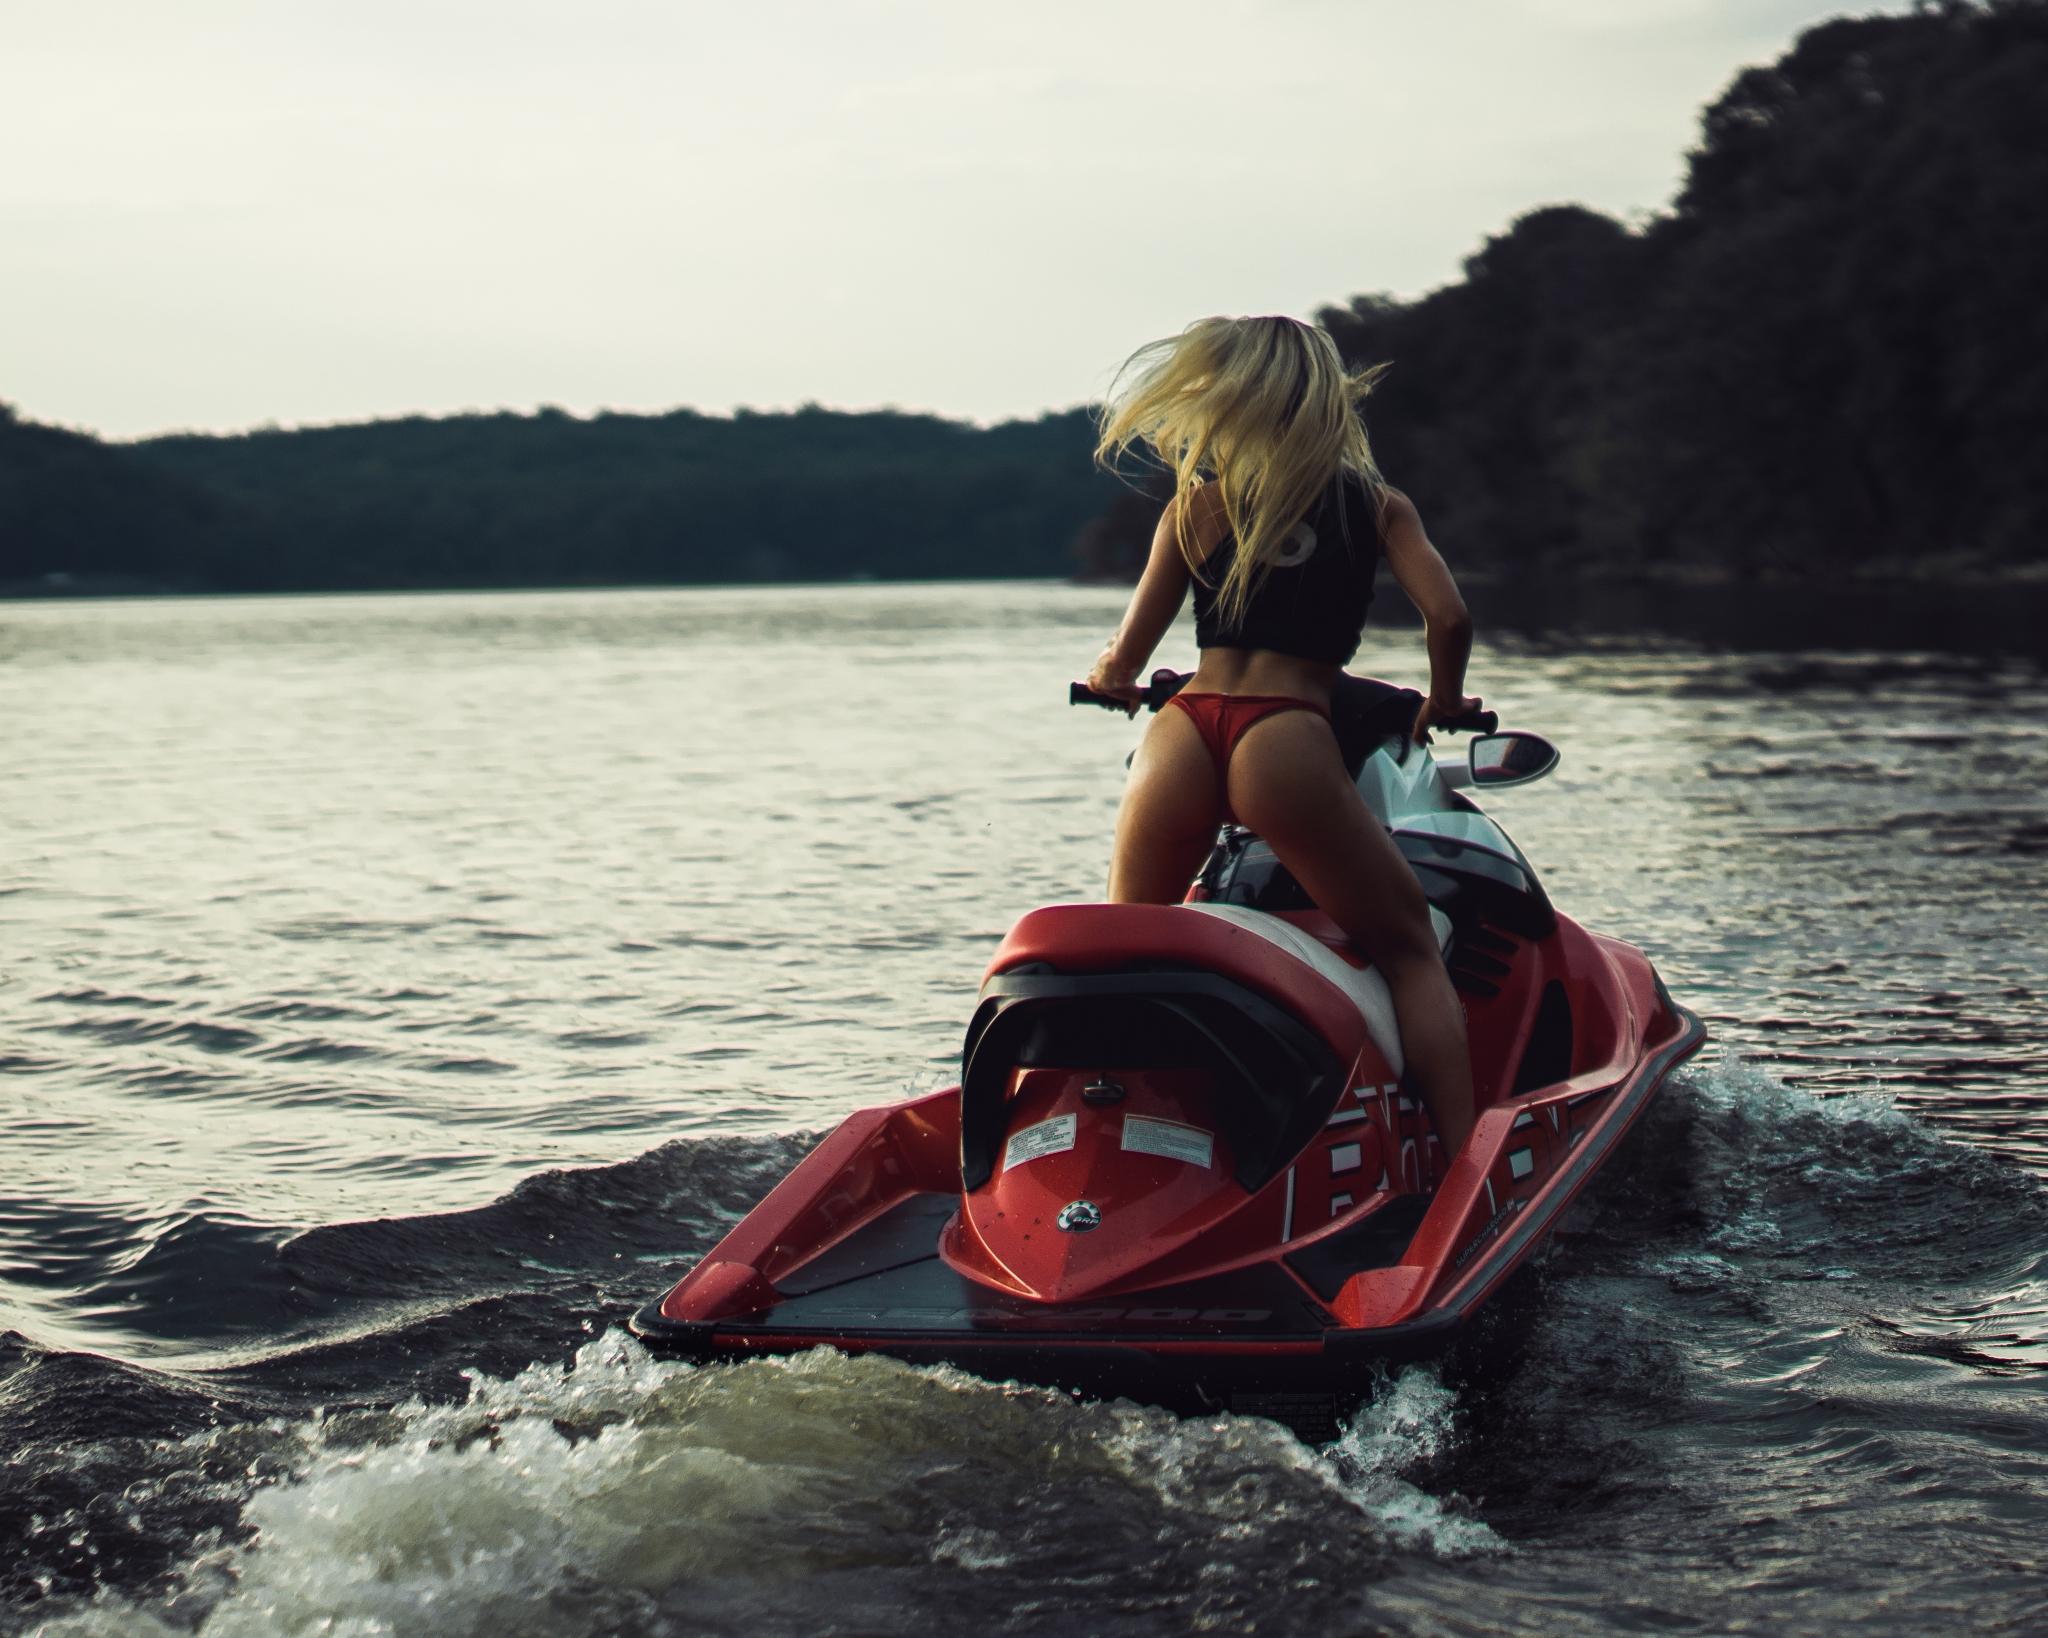 People 2048x1638 women model blonde bikini bikini bottoms ass back jetskis lake women outdoors